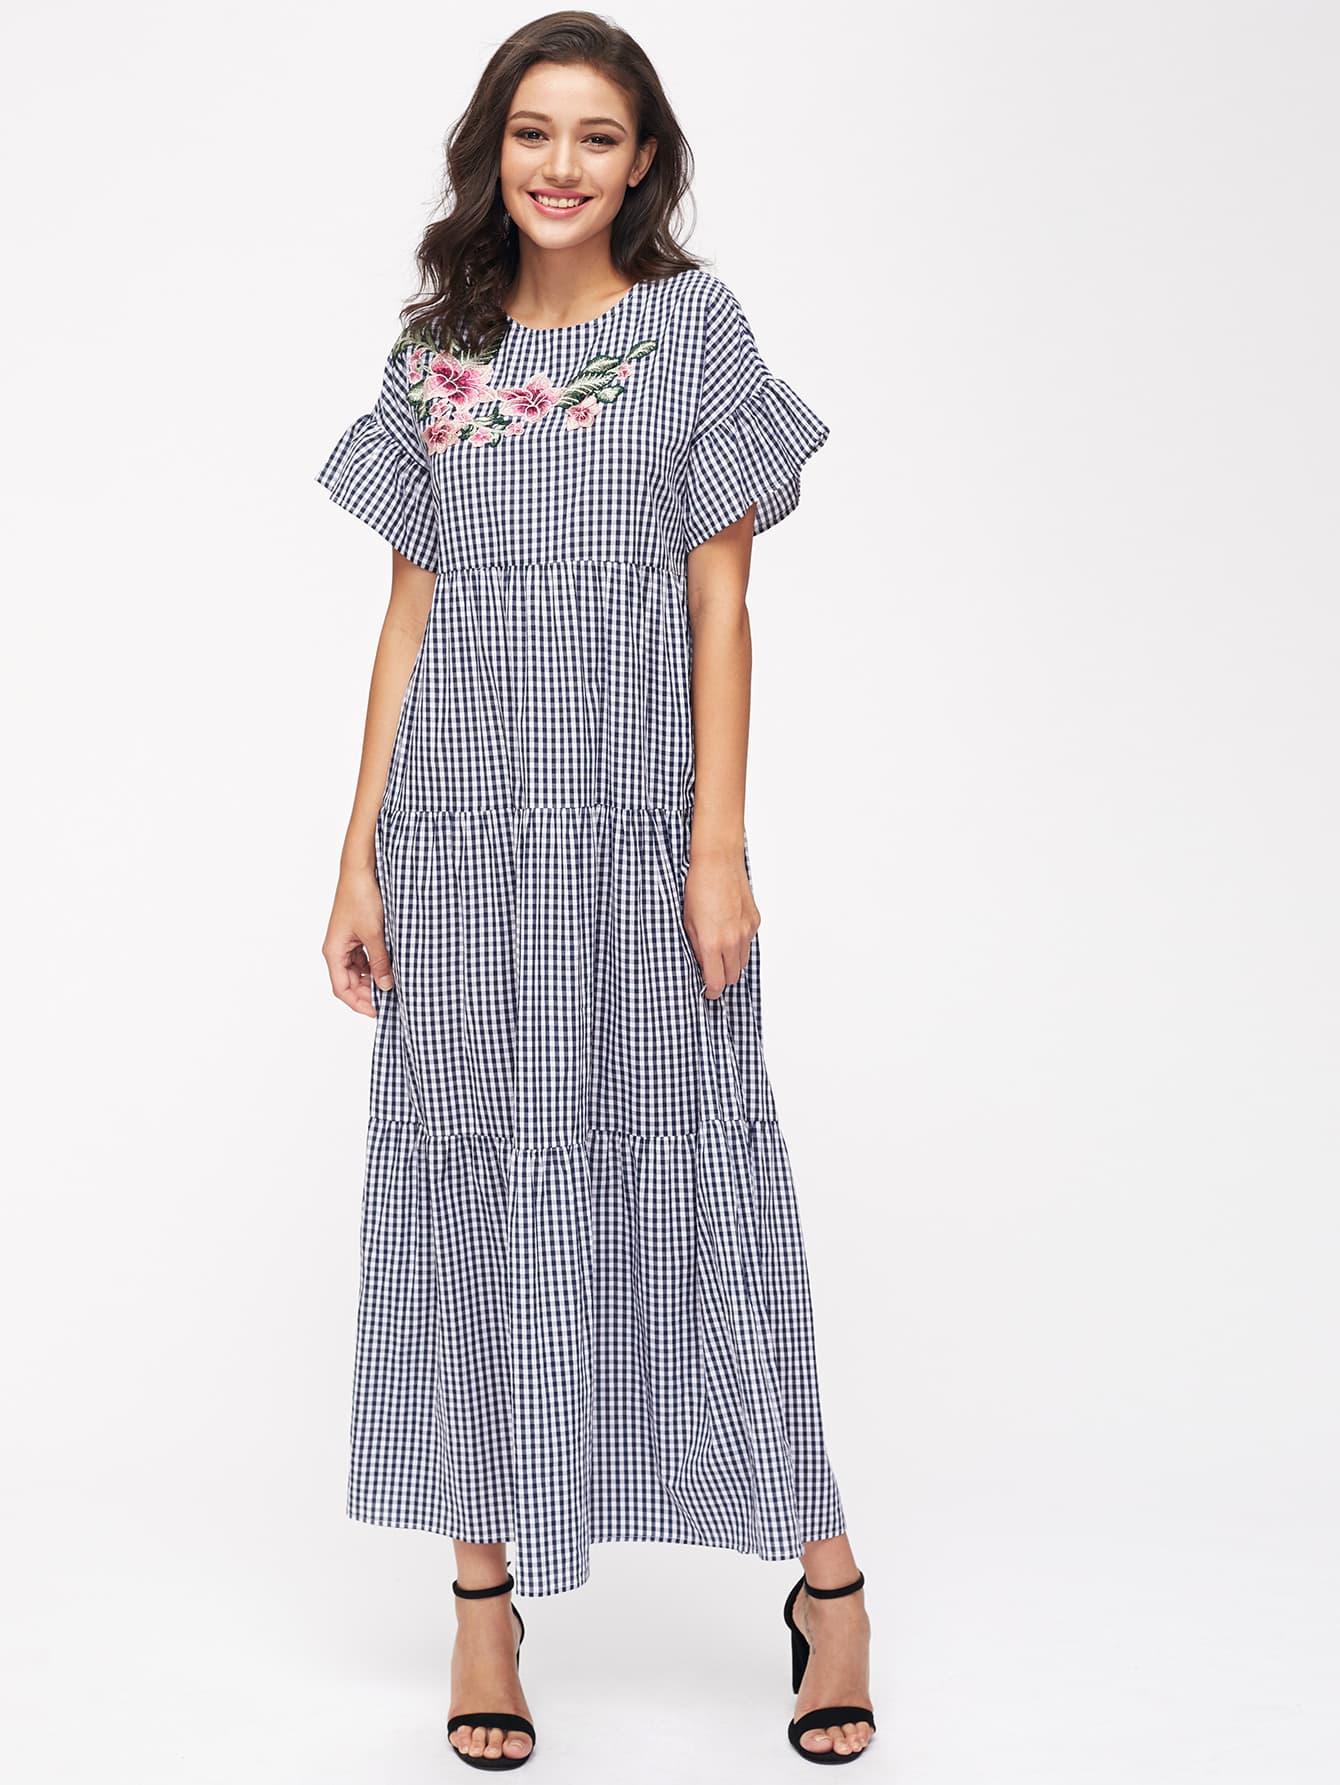 Фото Embroidered Flower Patch Frilled Sleeve Tiered Checkered Dress. Купить с доставкой